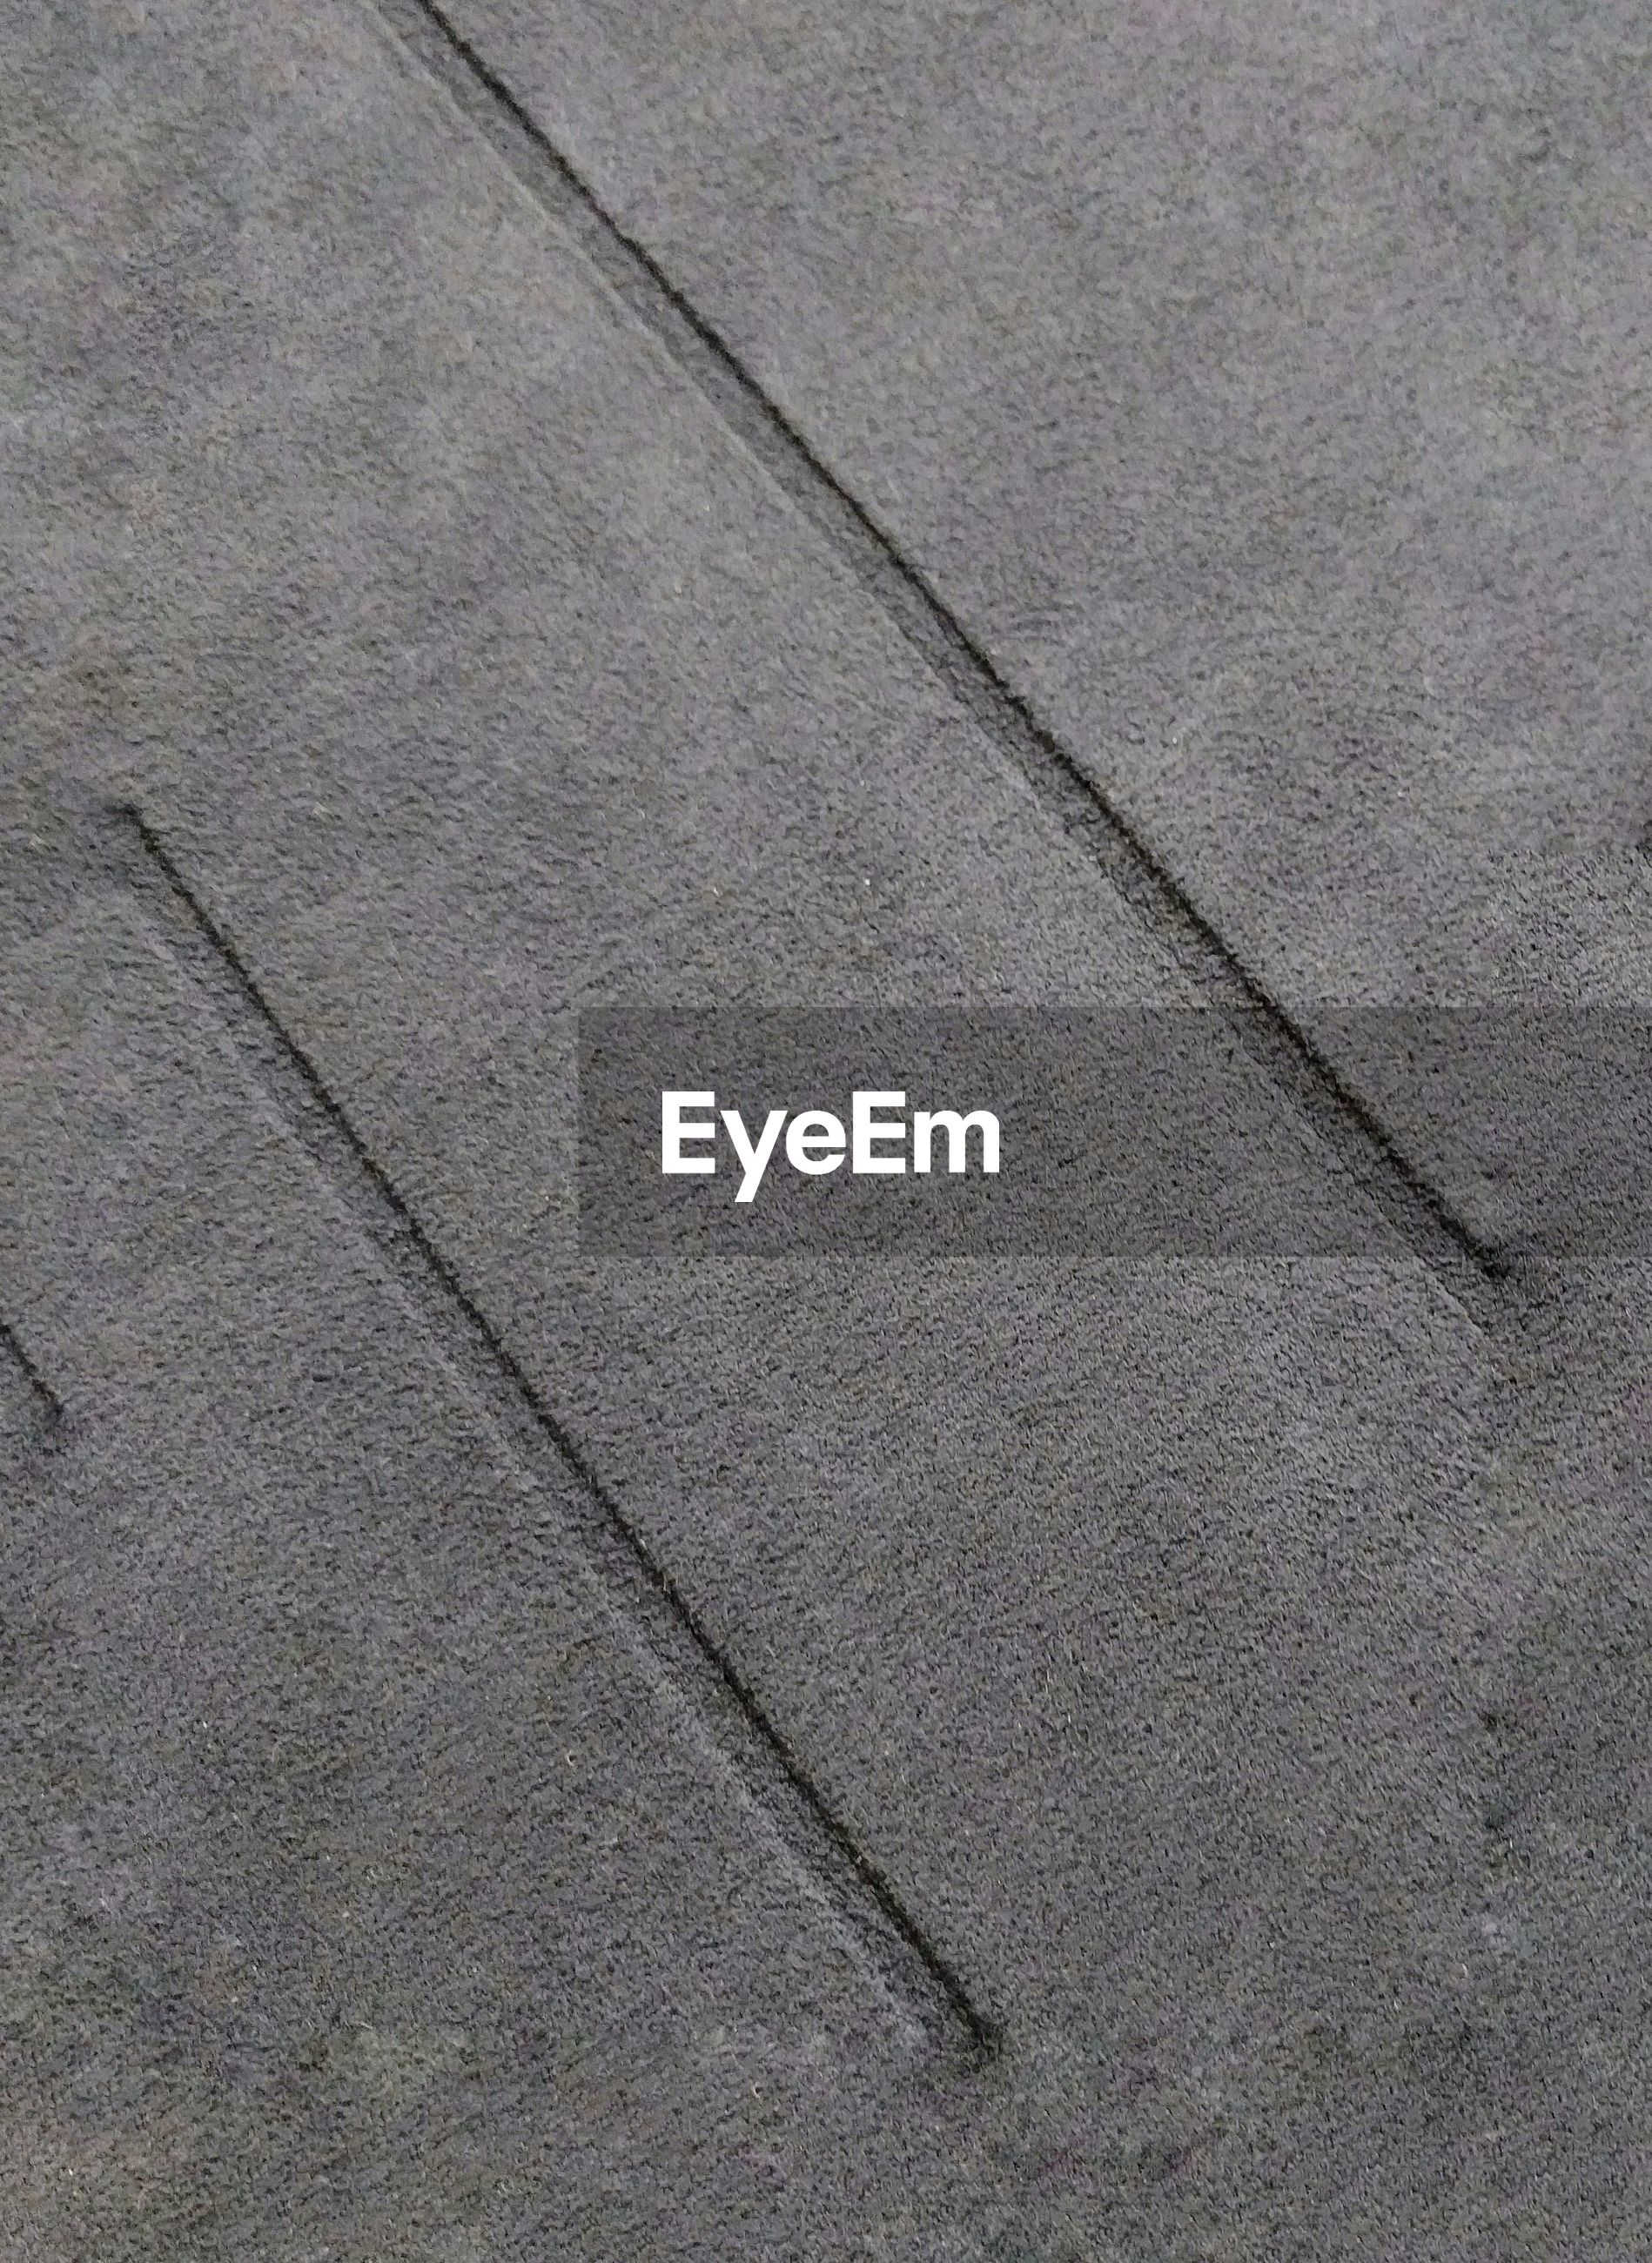 Full frame shot of concrete footpath